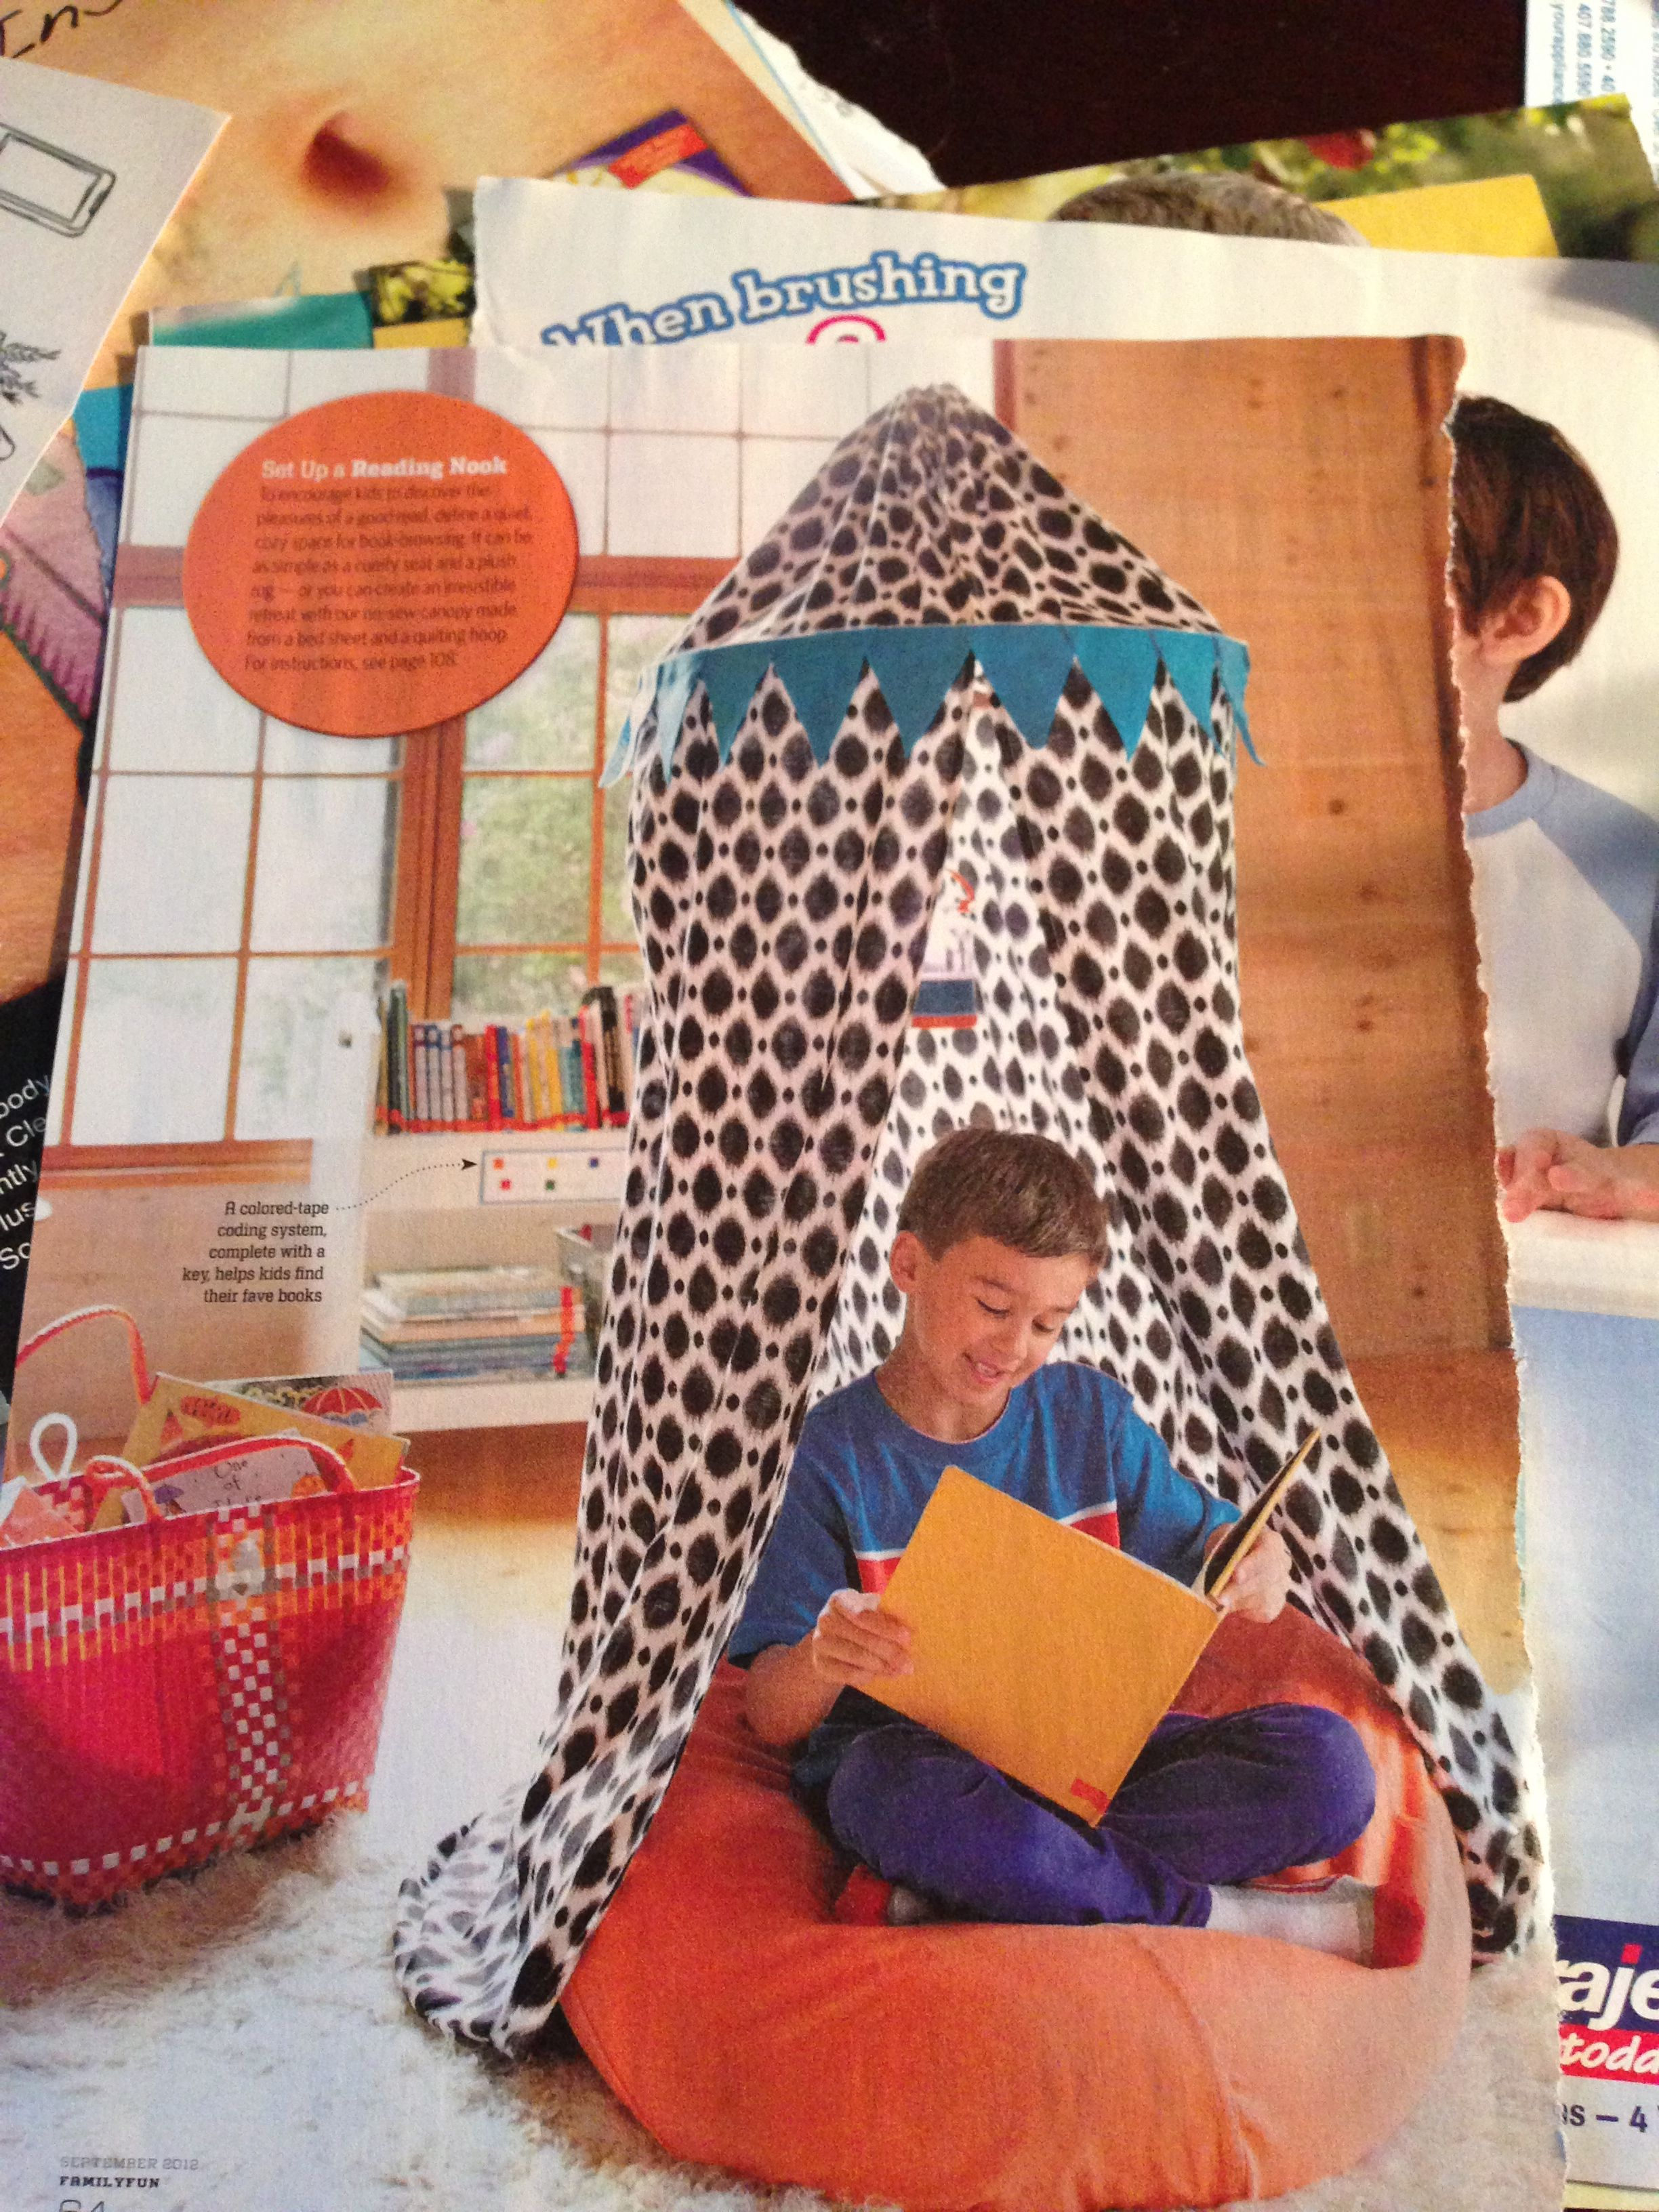 Reading nook for kids